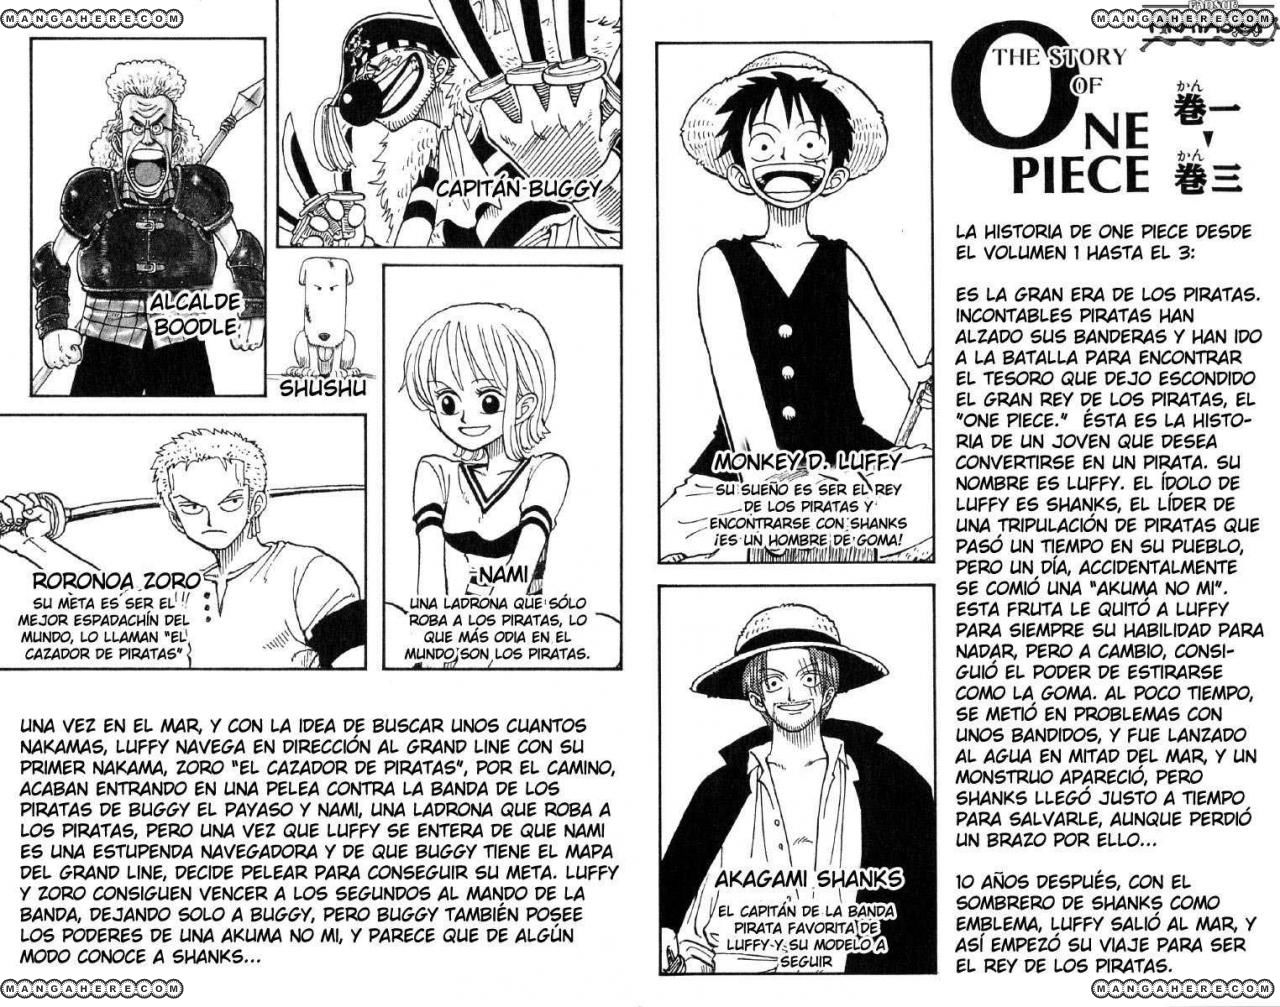 https://c5.ninemanga.com/es_manga/50/114/309125/2b8ed17fbe7858c641d55ca03eb8ace3.jpg Page 3